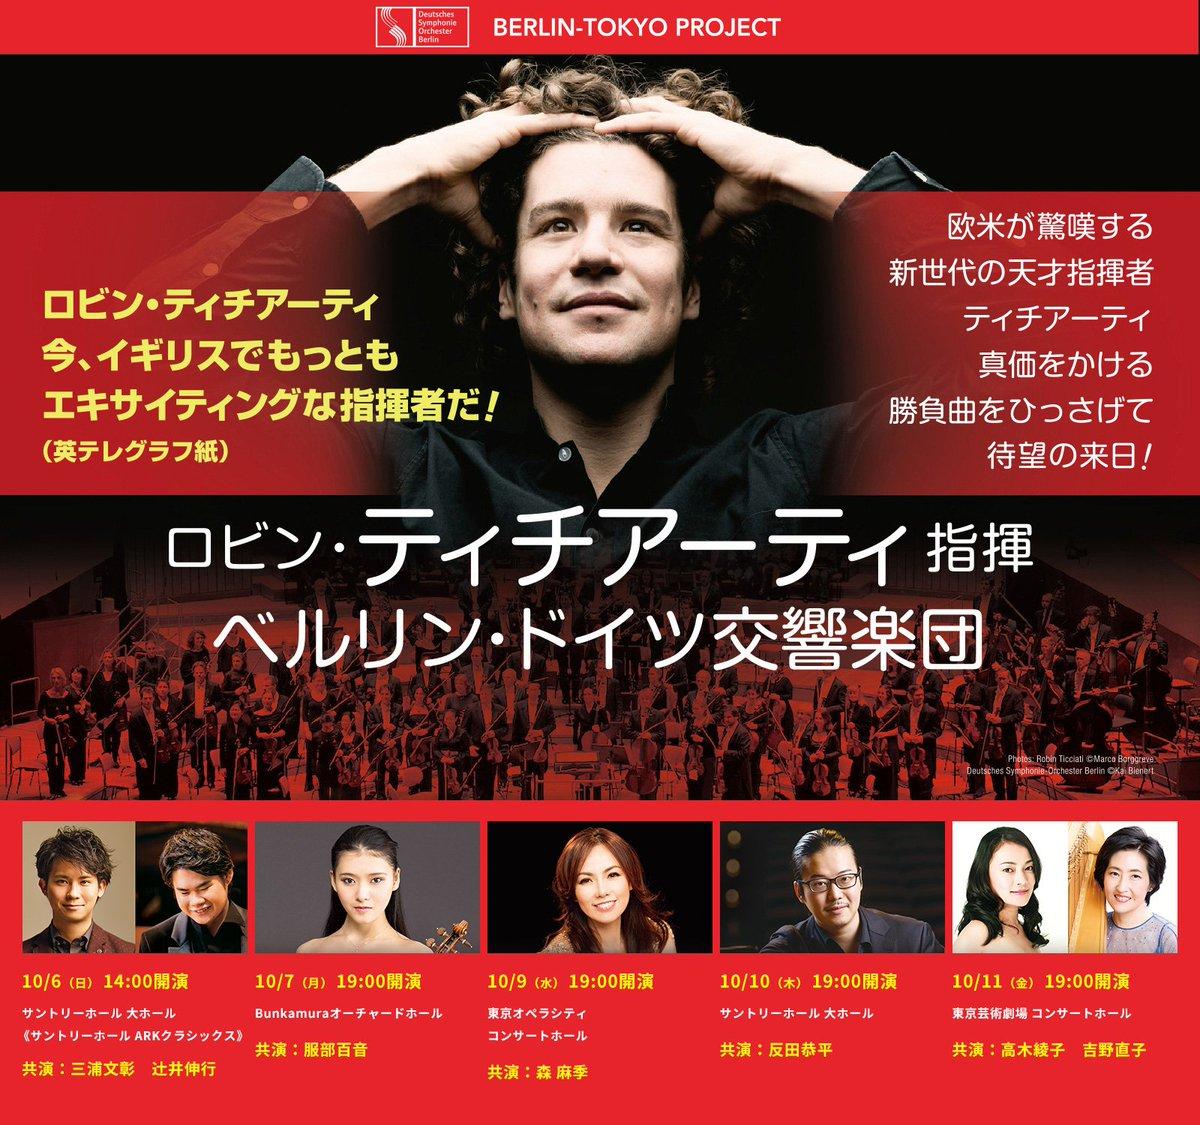 program festival enescu 2019 pdf